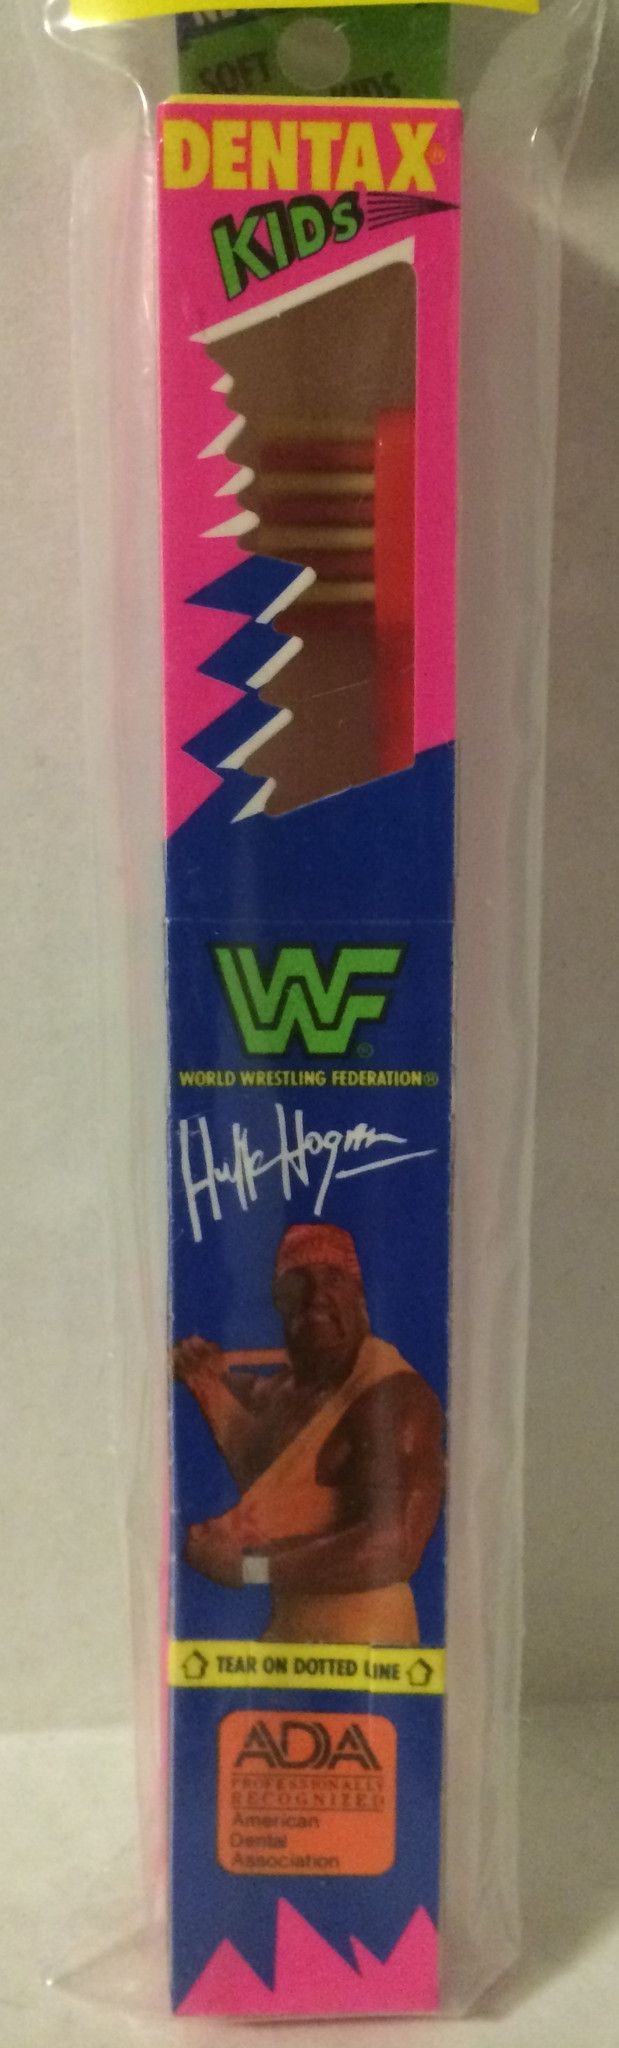 (GBS04587) - WWF WWE WCW nWo Wrestling Dentax Kids Toothbrush - Hulk Hogan